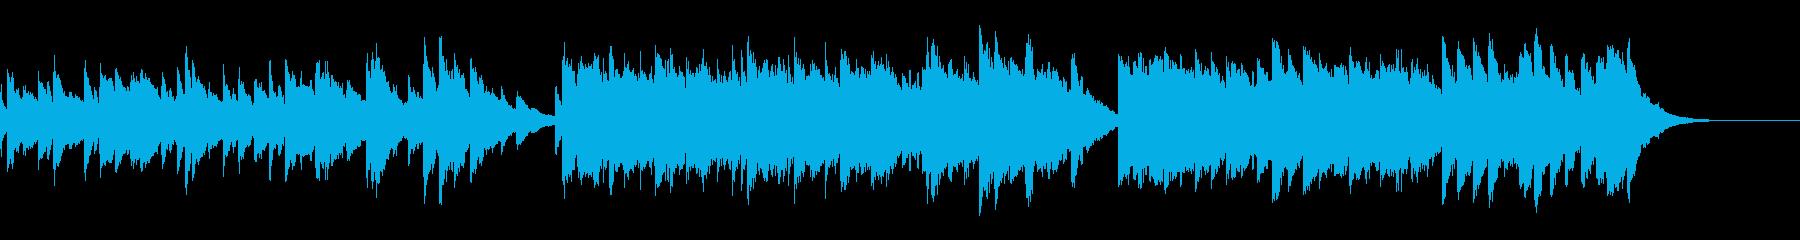 T.V.コンテンポラリーインストバ...の再生済みの波形